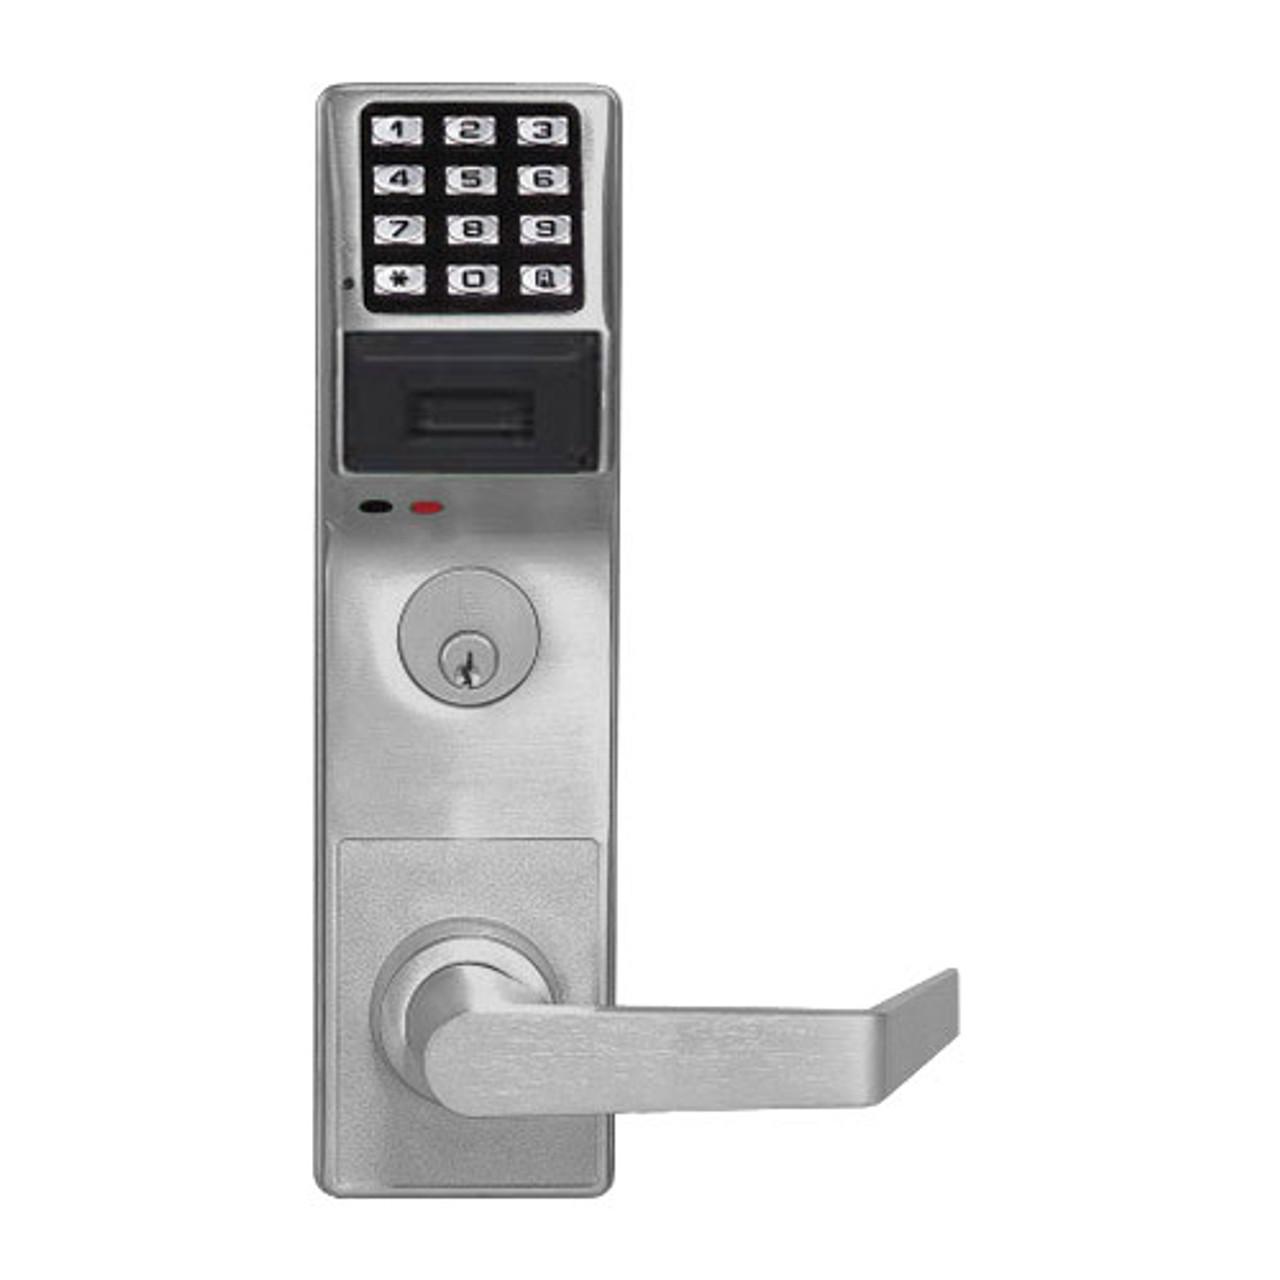 PDL3500DBR-US26D Alarm Lock Trilogy Electronic Digital Lock in Satin Chrome Finish